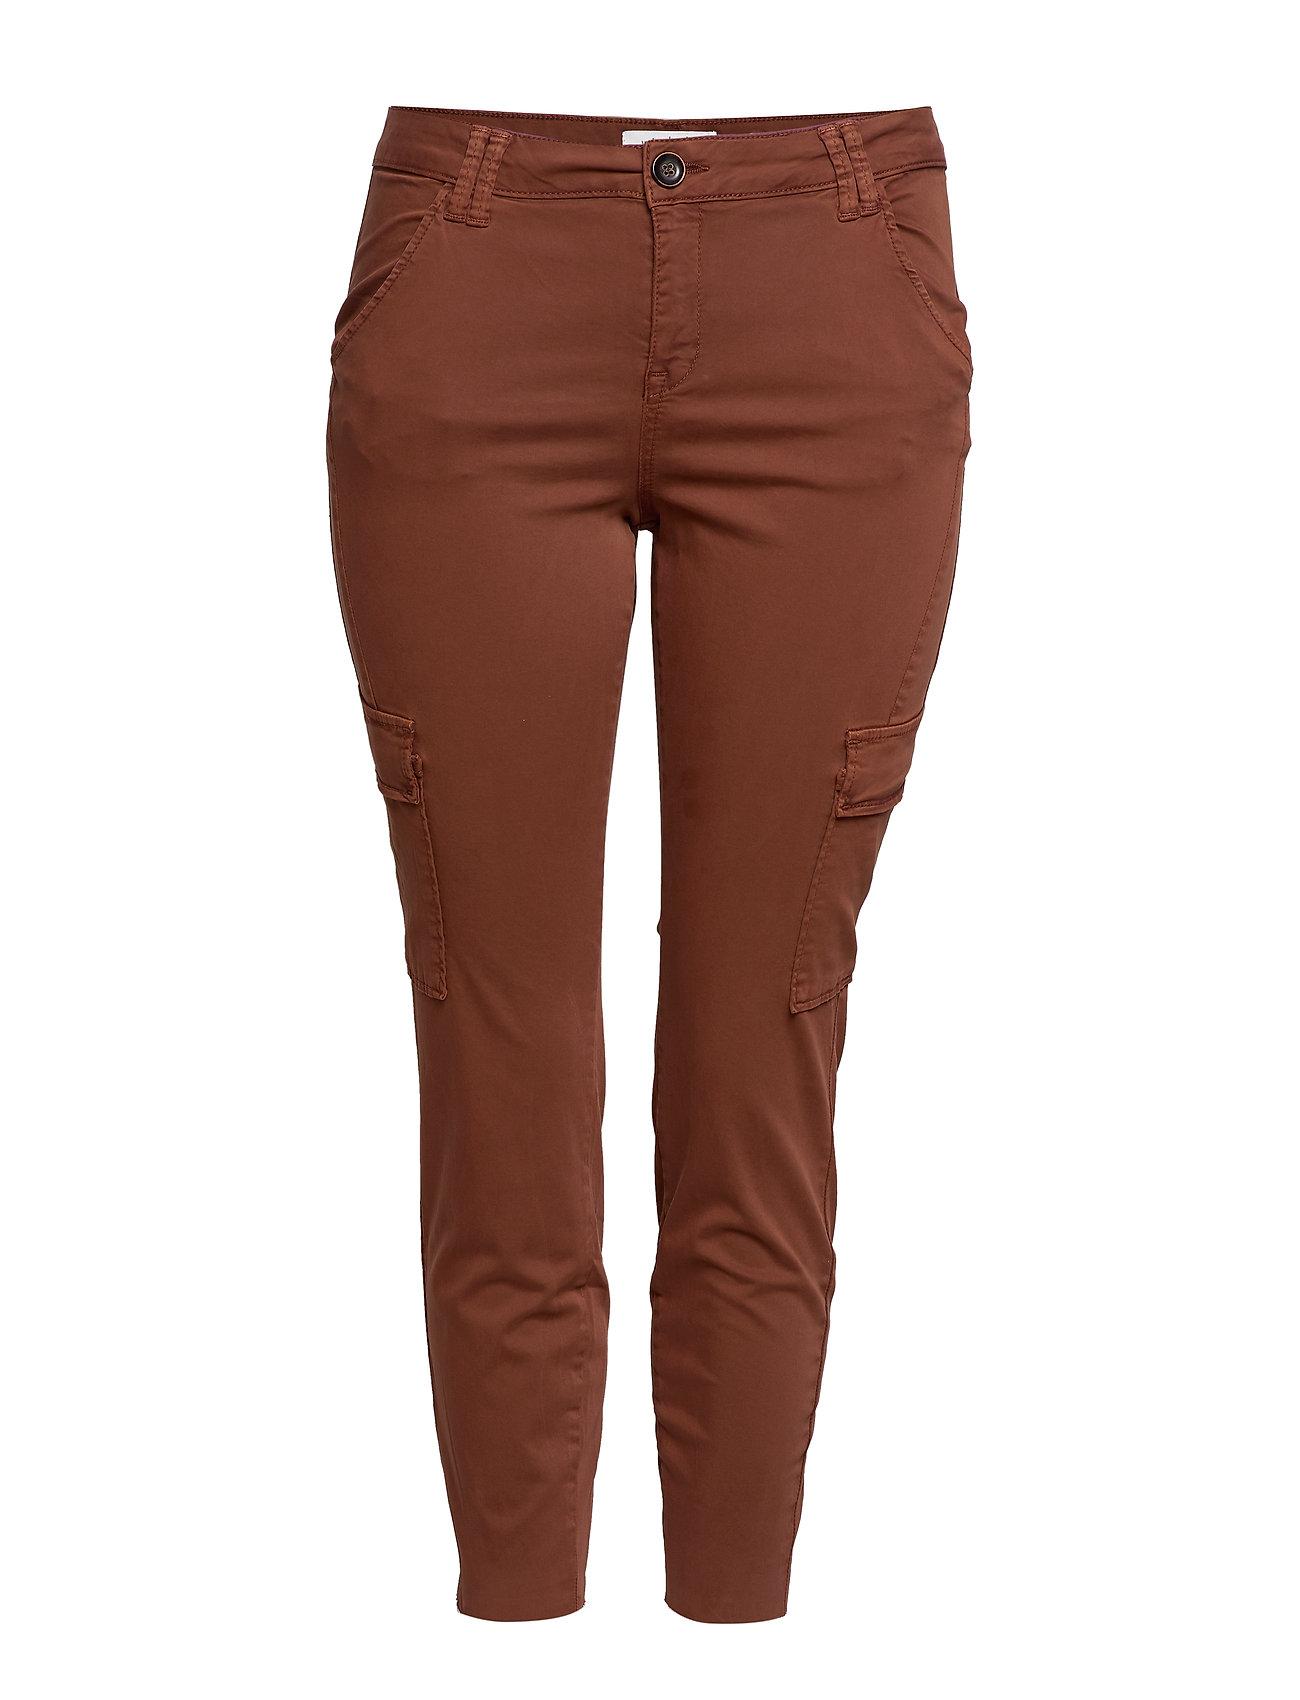 Violeta by Mango Cotton cargo trousers - MEDIUM ORANGE